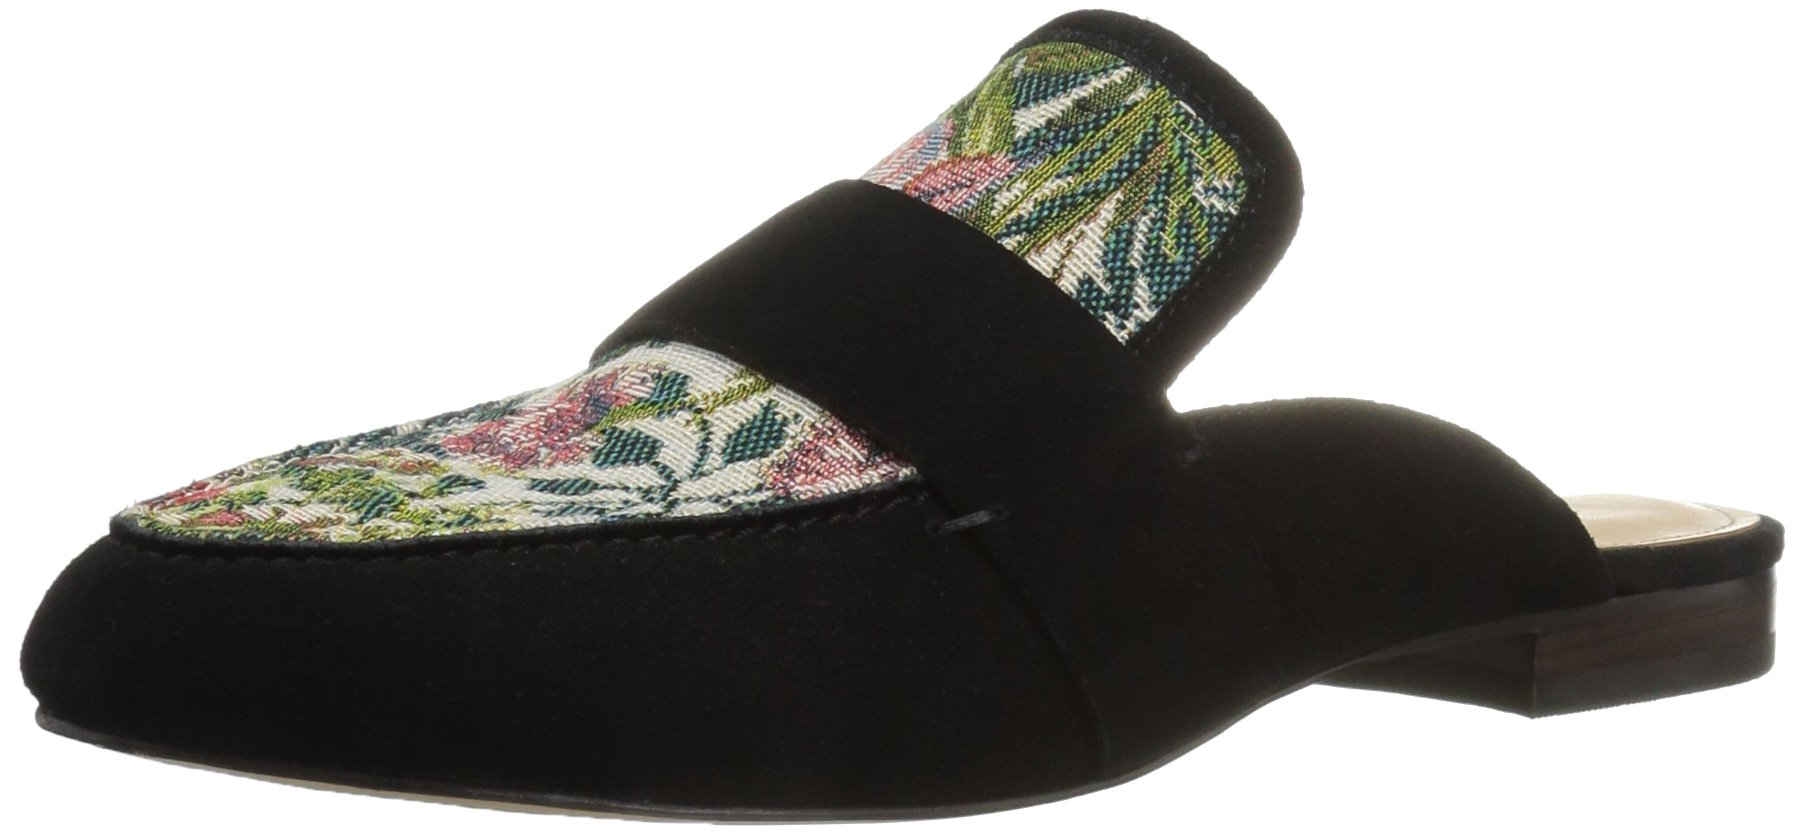 The Fix Women's French Floral Tapestry Slide Slip-on Loafer, Black/Multi, 9.5 B US